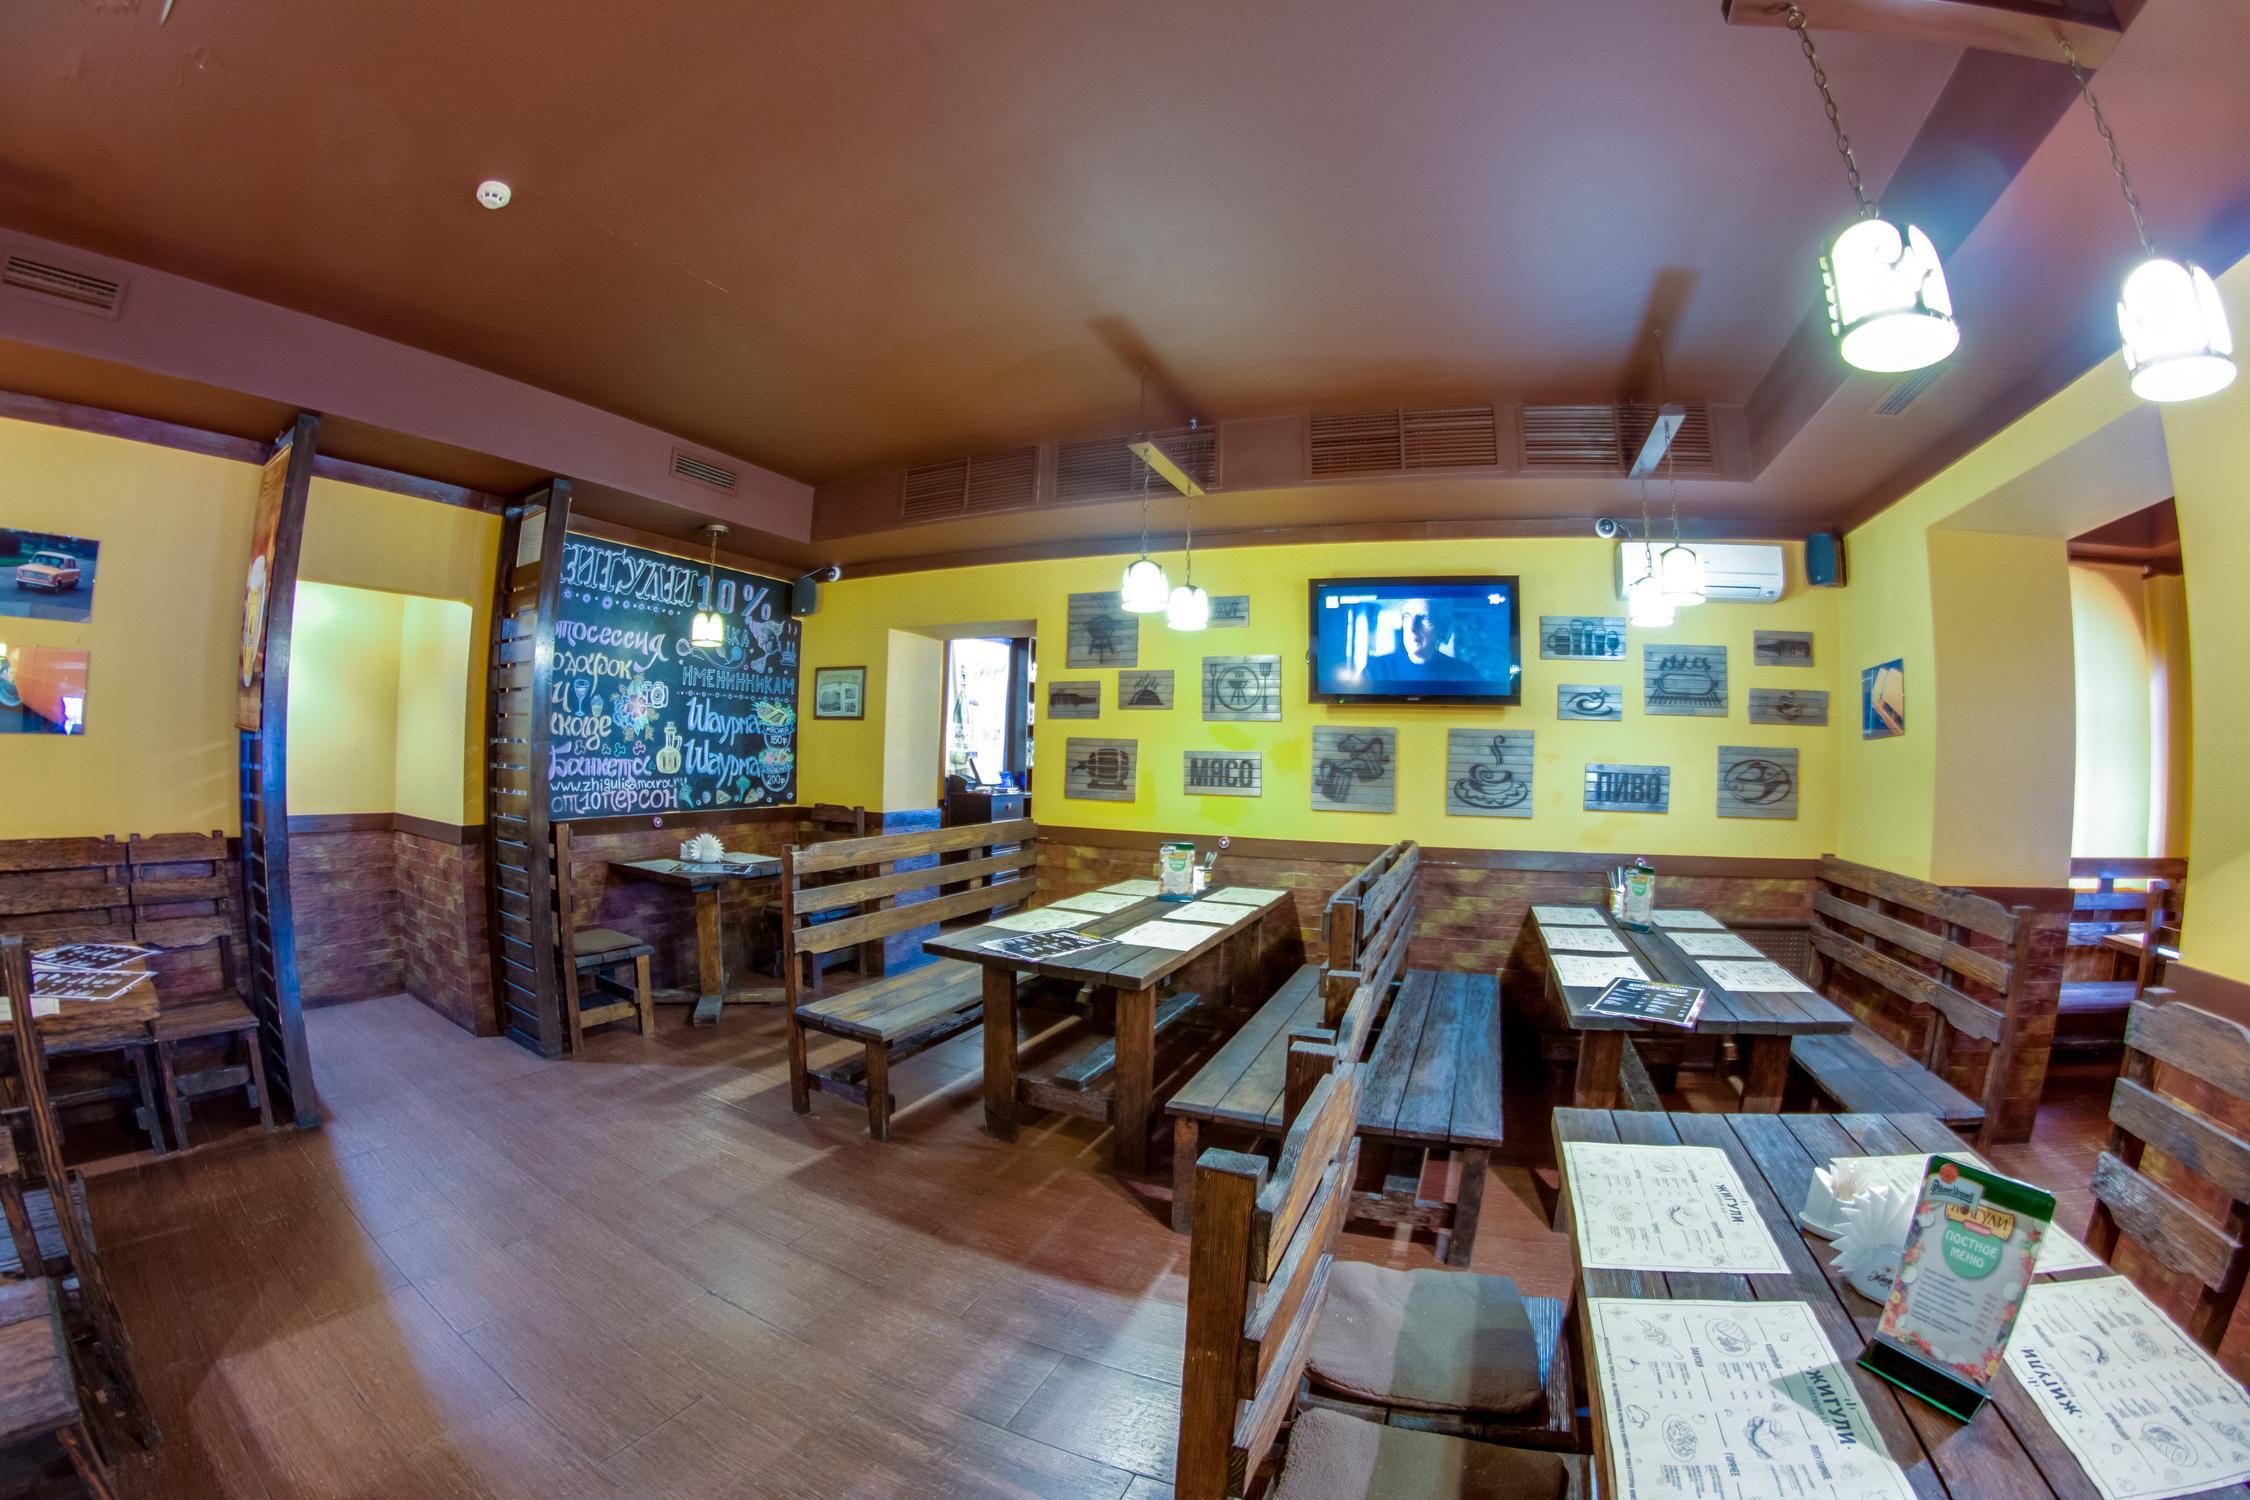 фотография Ресторана & бара Жигули на улице Стара-Загора, 142б